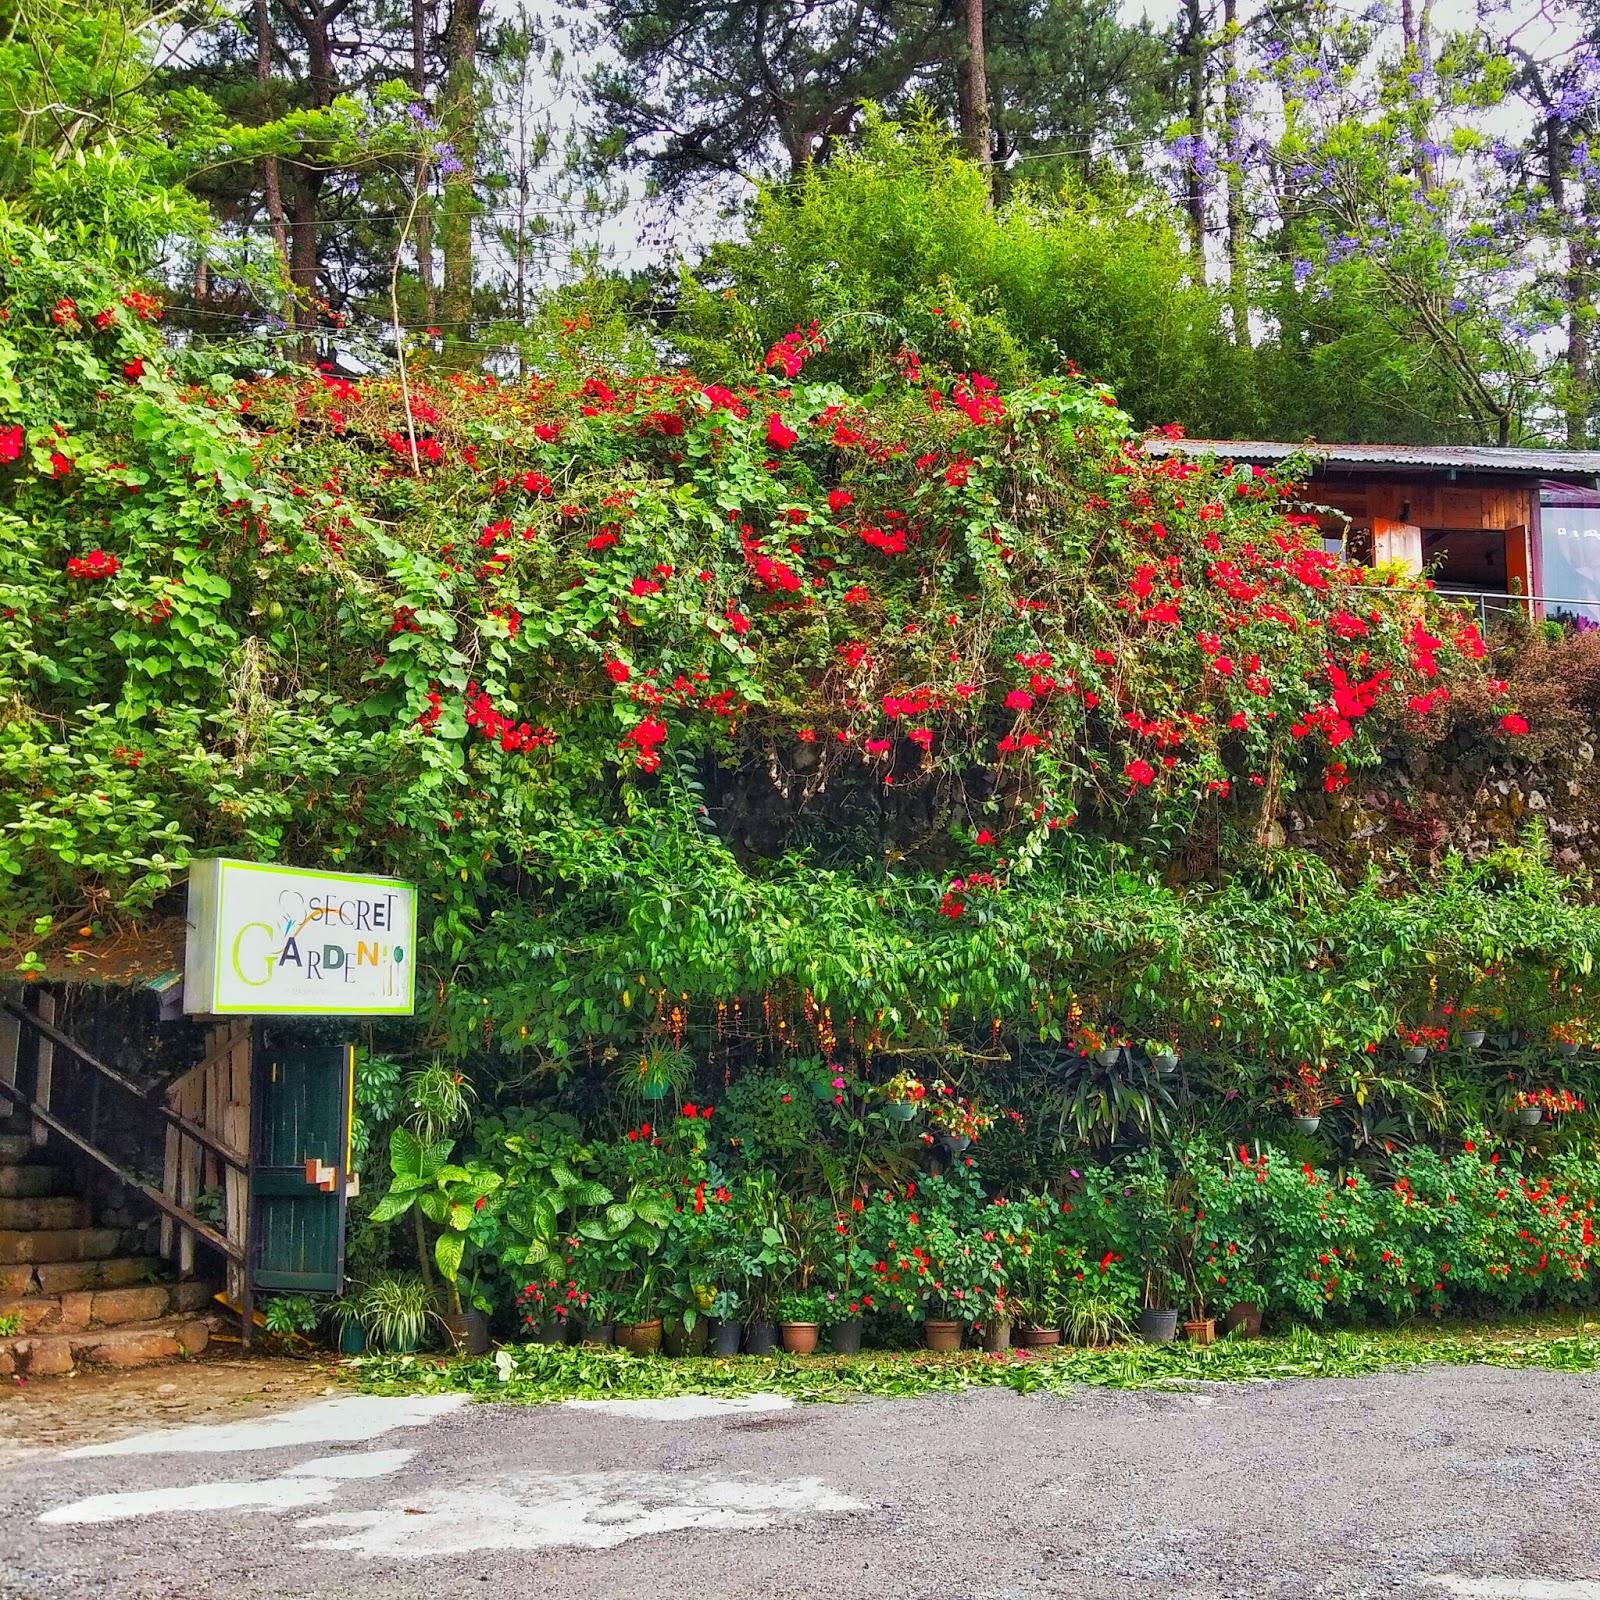 Secret Garden Baguio | Sidestrip: Food, Travel, Technology & More...